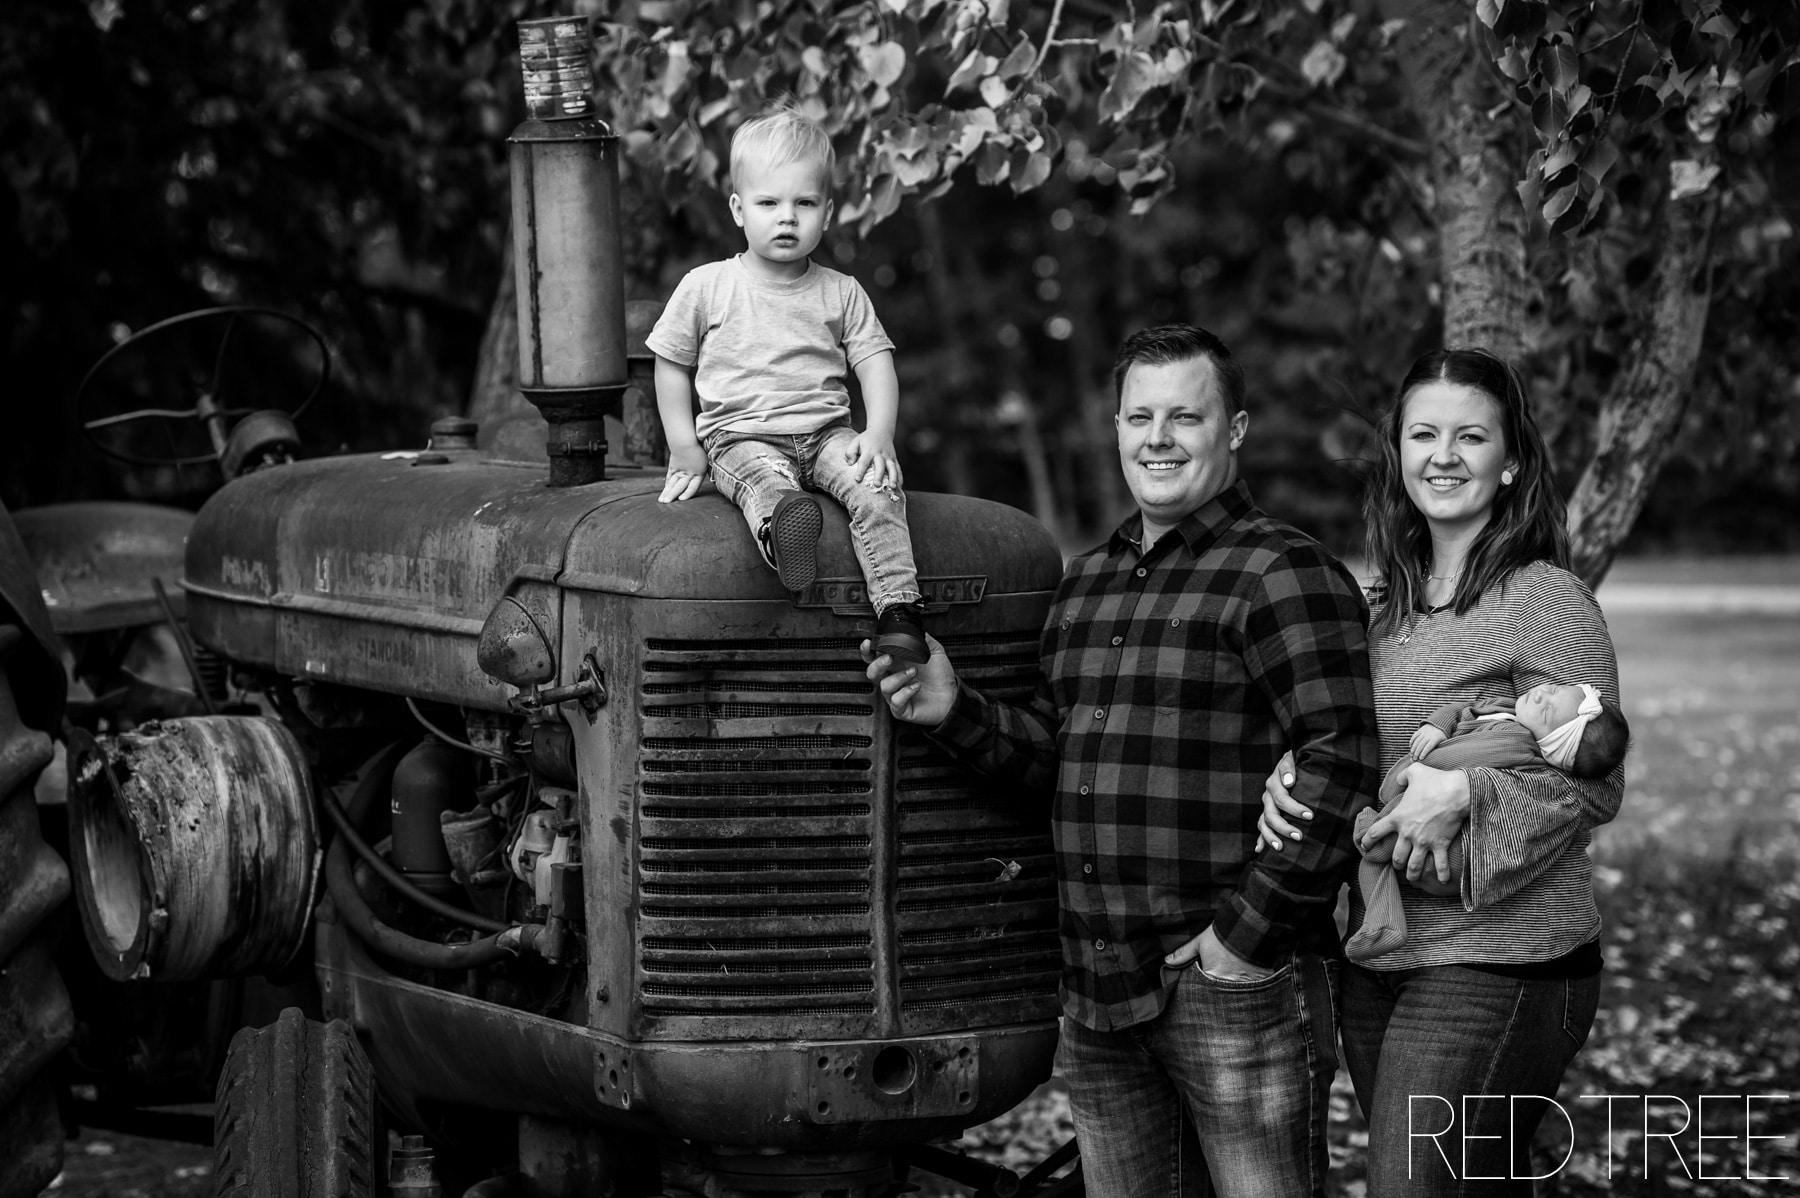 Cherry Lane Family Photography: Newborn Photography at Cherry Lane BnB